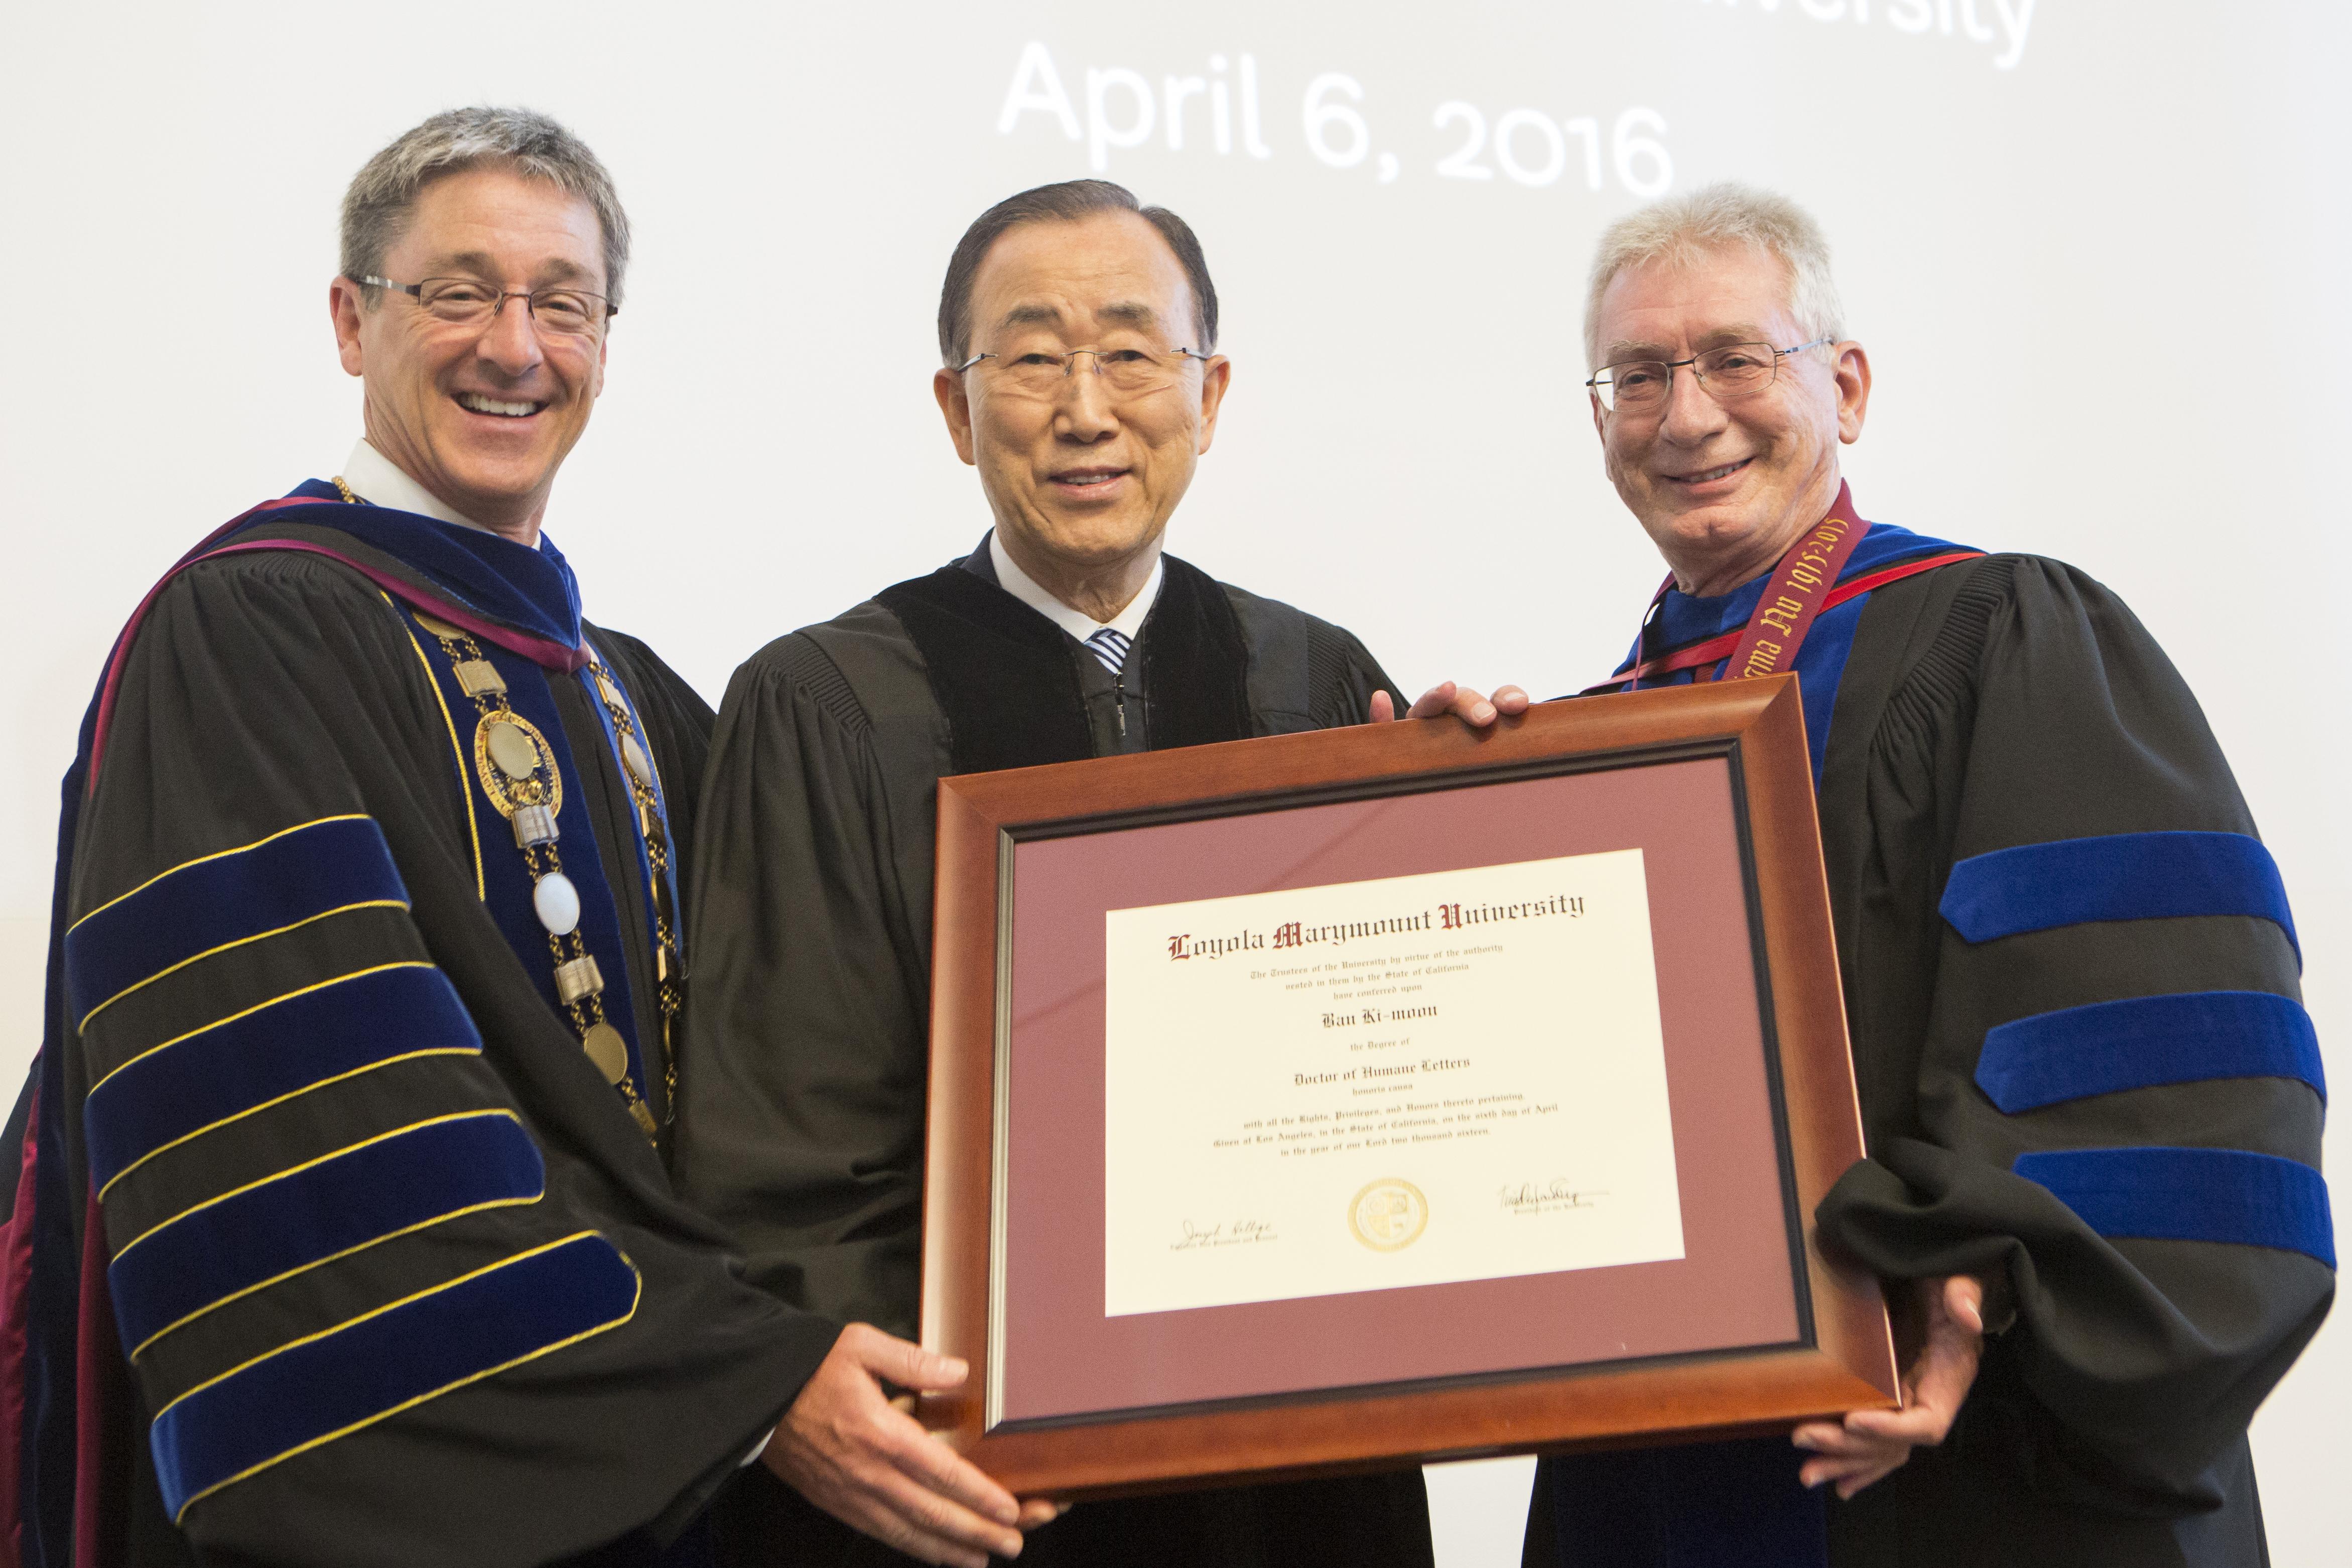 U8A8414 - UN Secretary-General Ban Ki-moon Receives Honorary LMU Degree